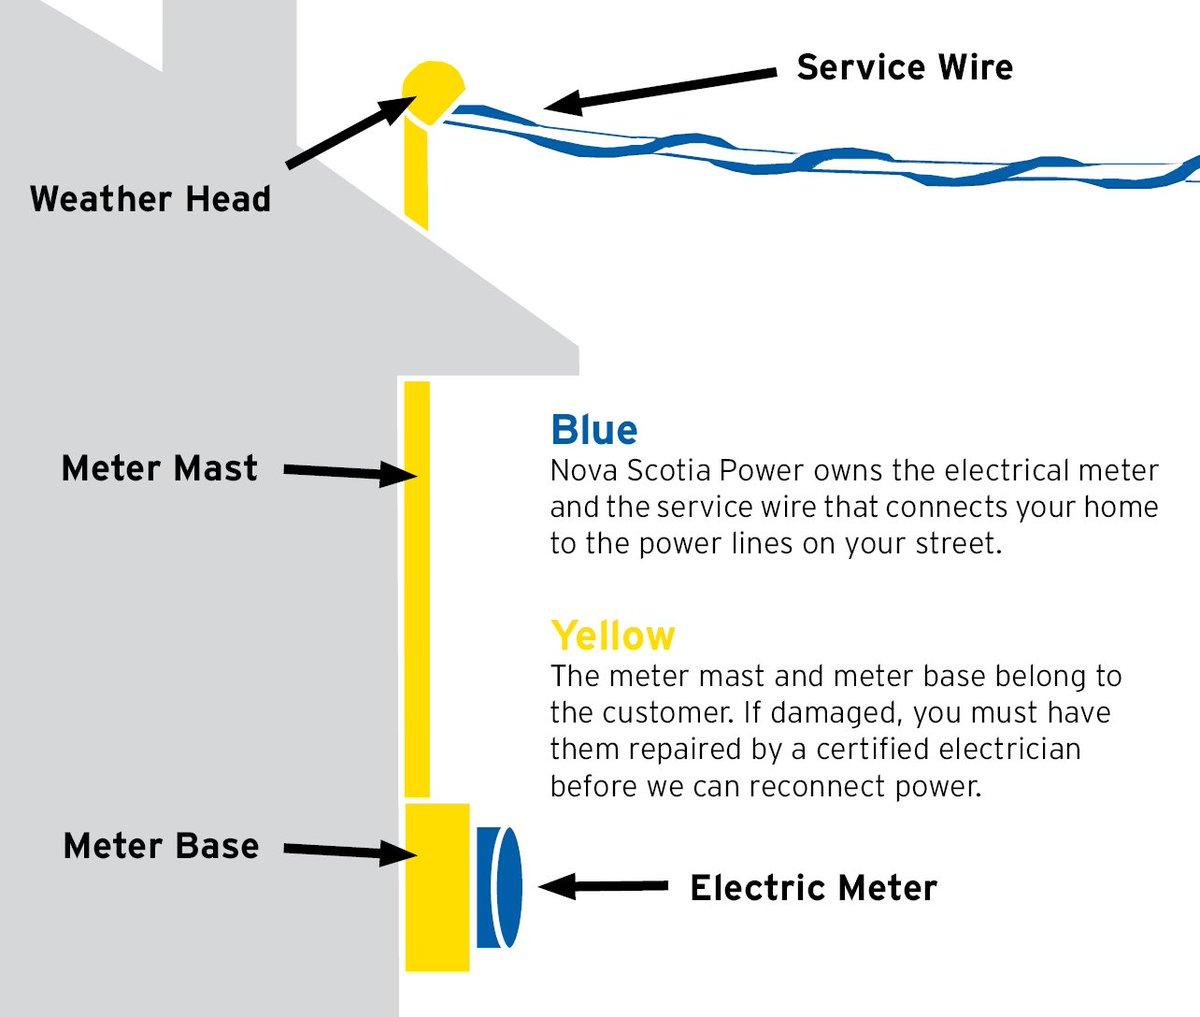 Nova Scotia Power on Twitter: